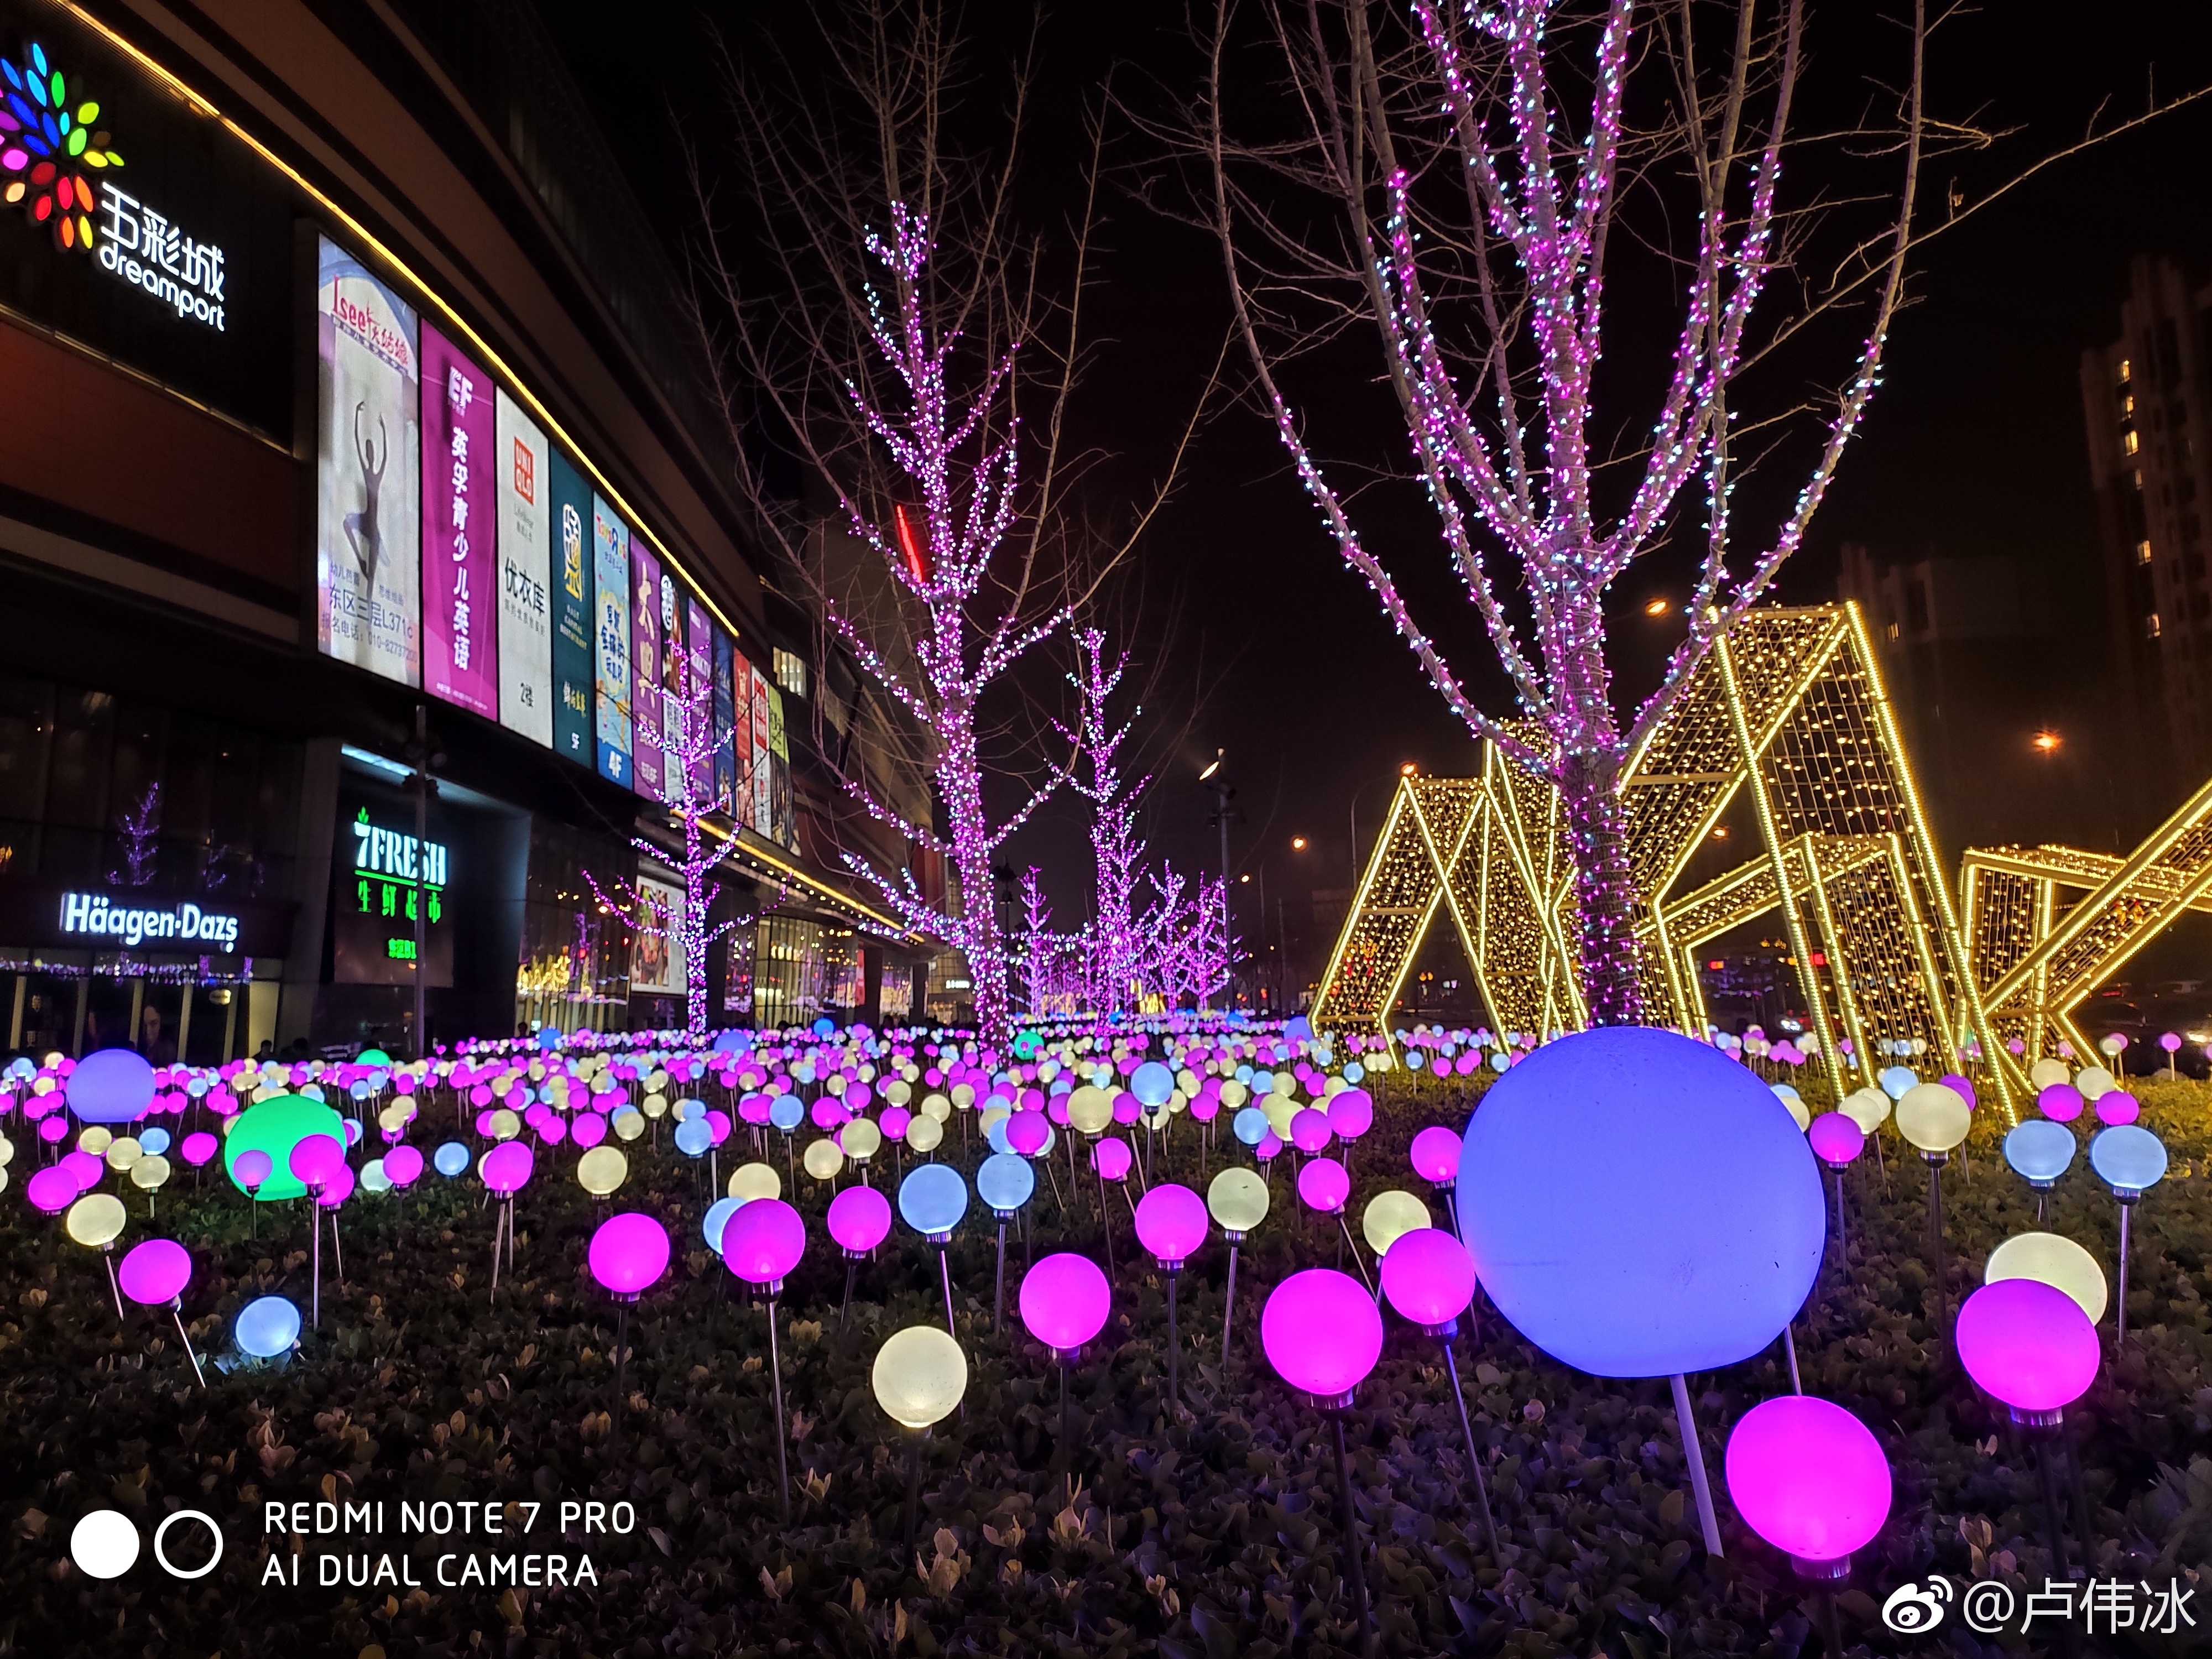 Redmi Note 7 Pro Night Mode camera sample